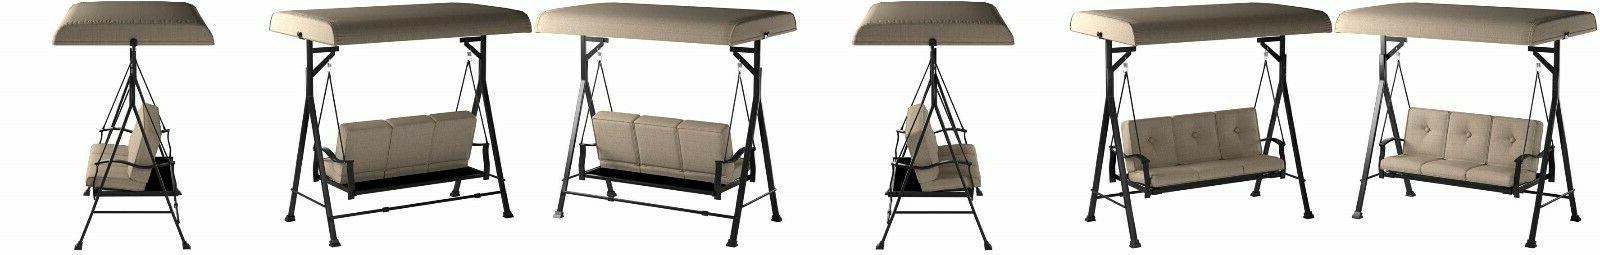 NEW Seat Patio Swing Cushion Free Shipping